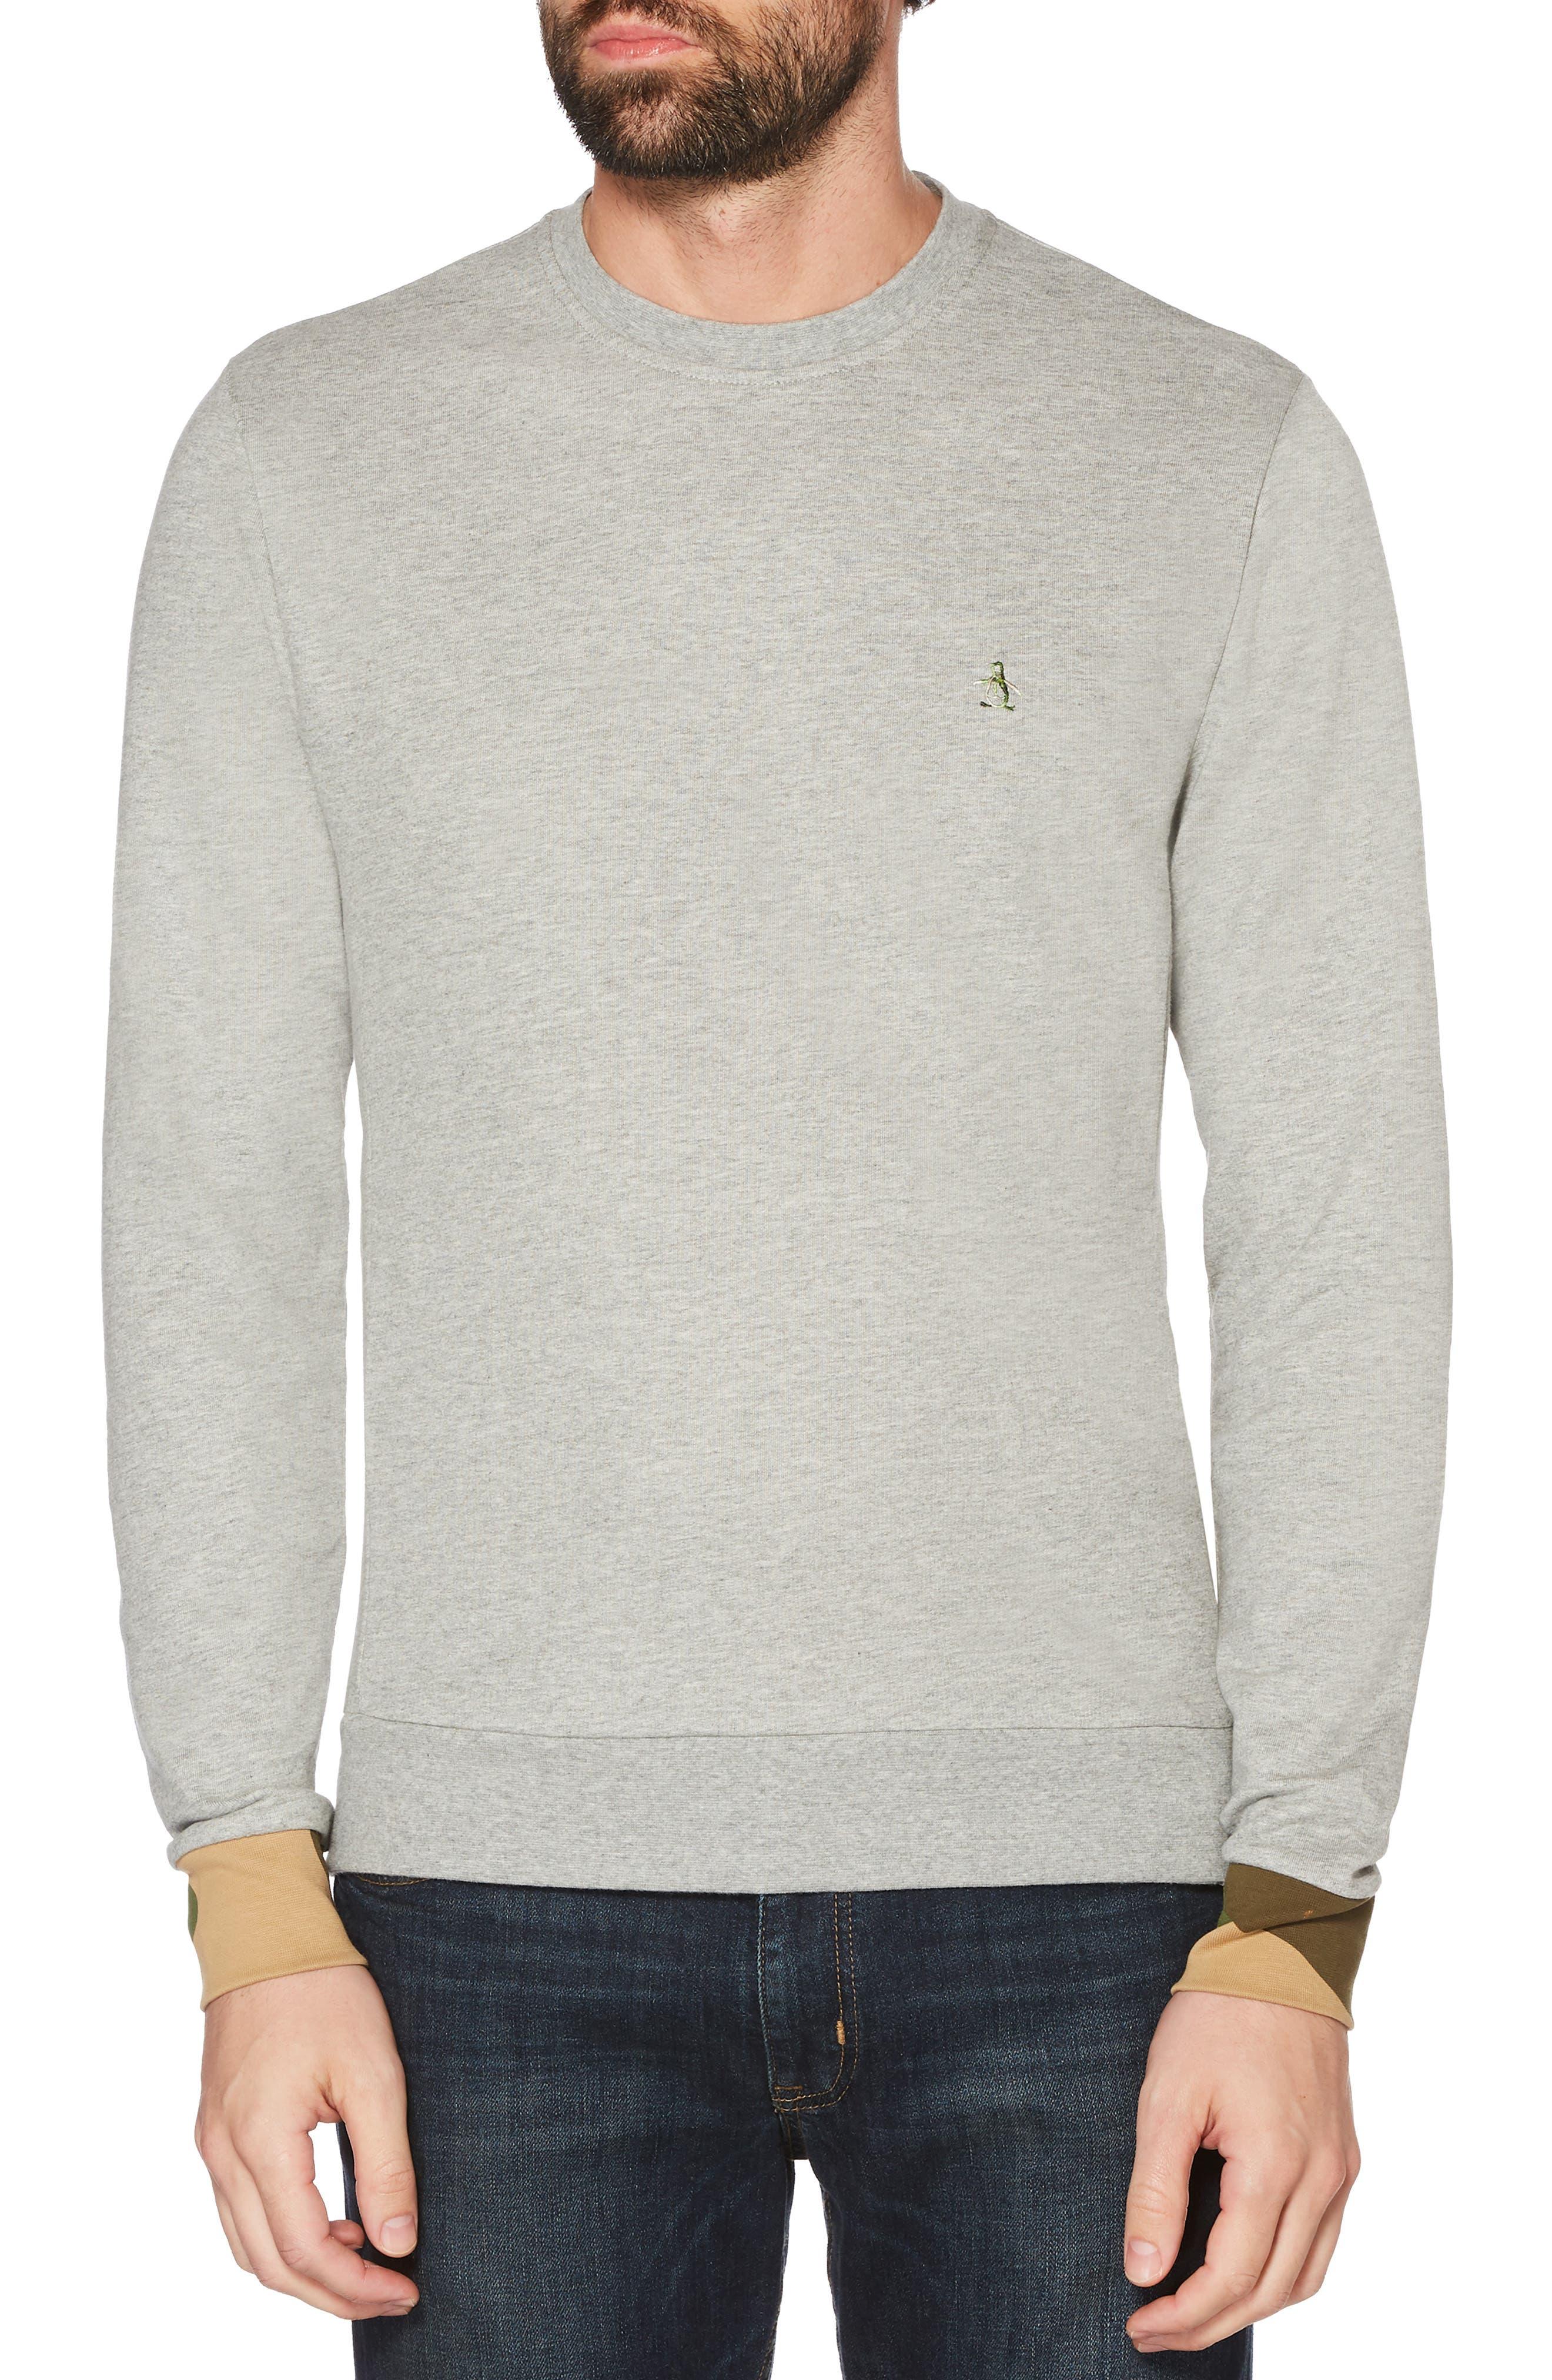 Camo Cuff Sweatshirt,                         Main,                         color, 080